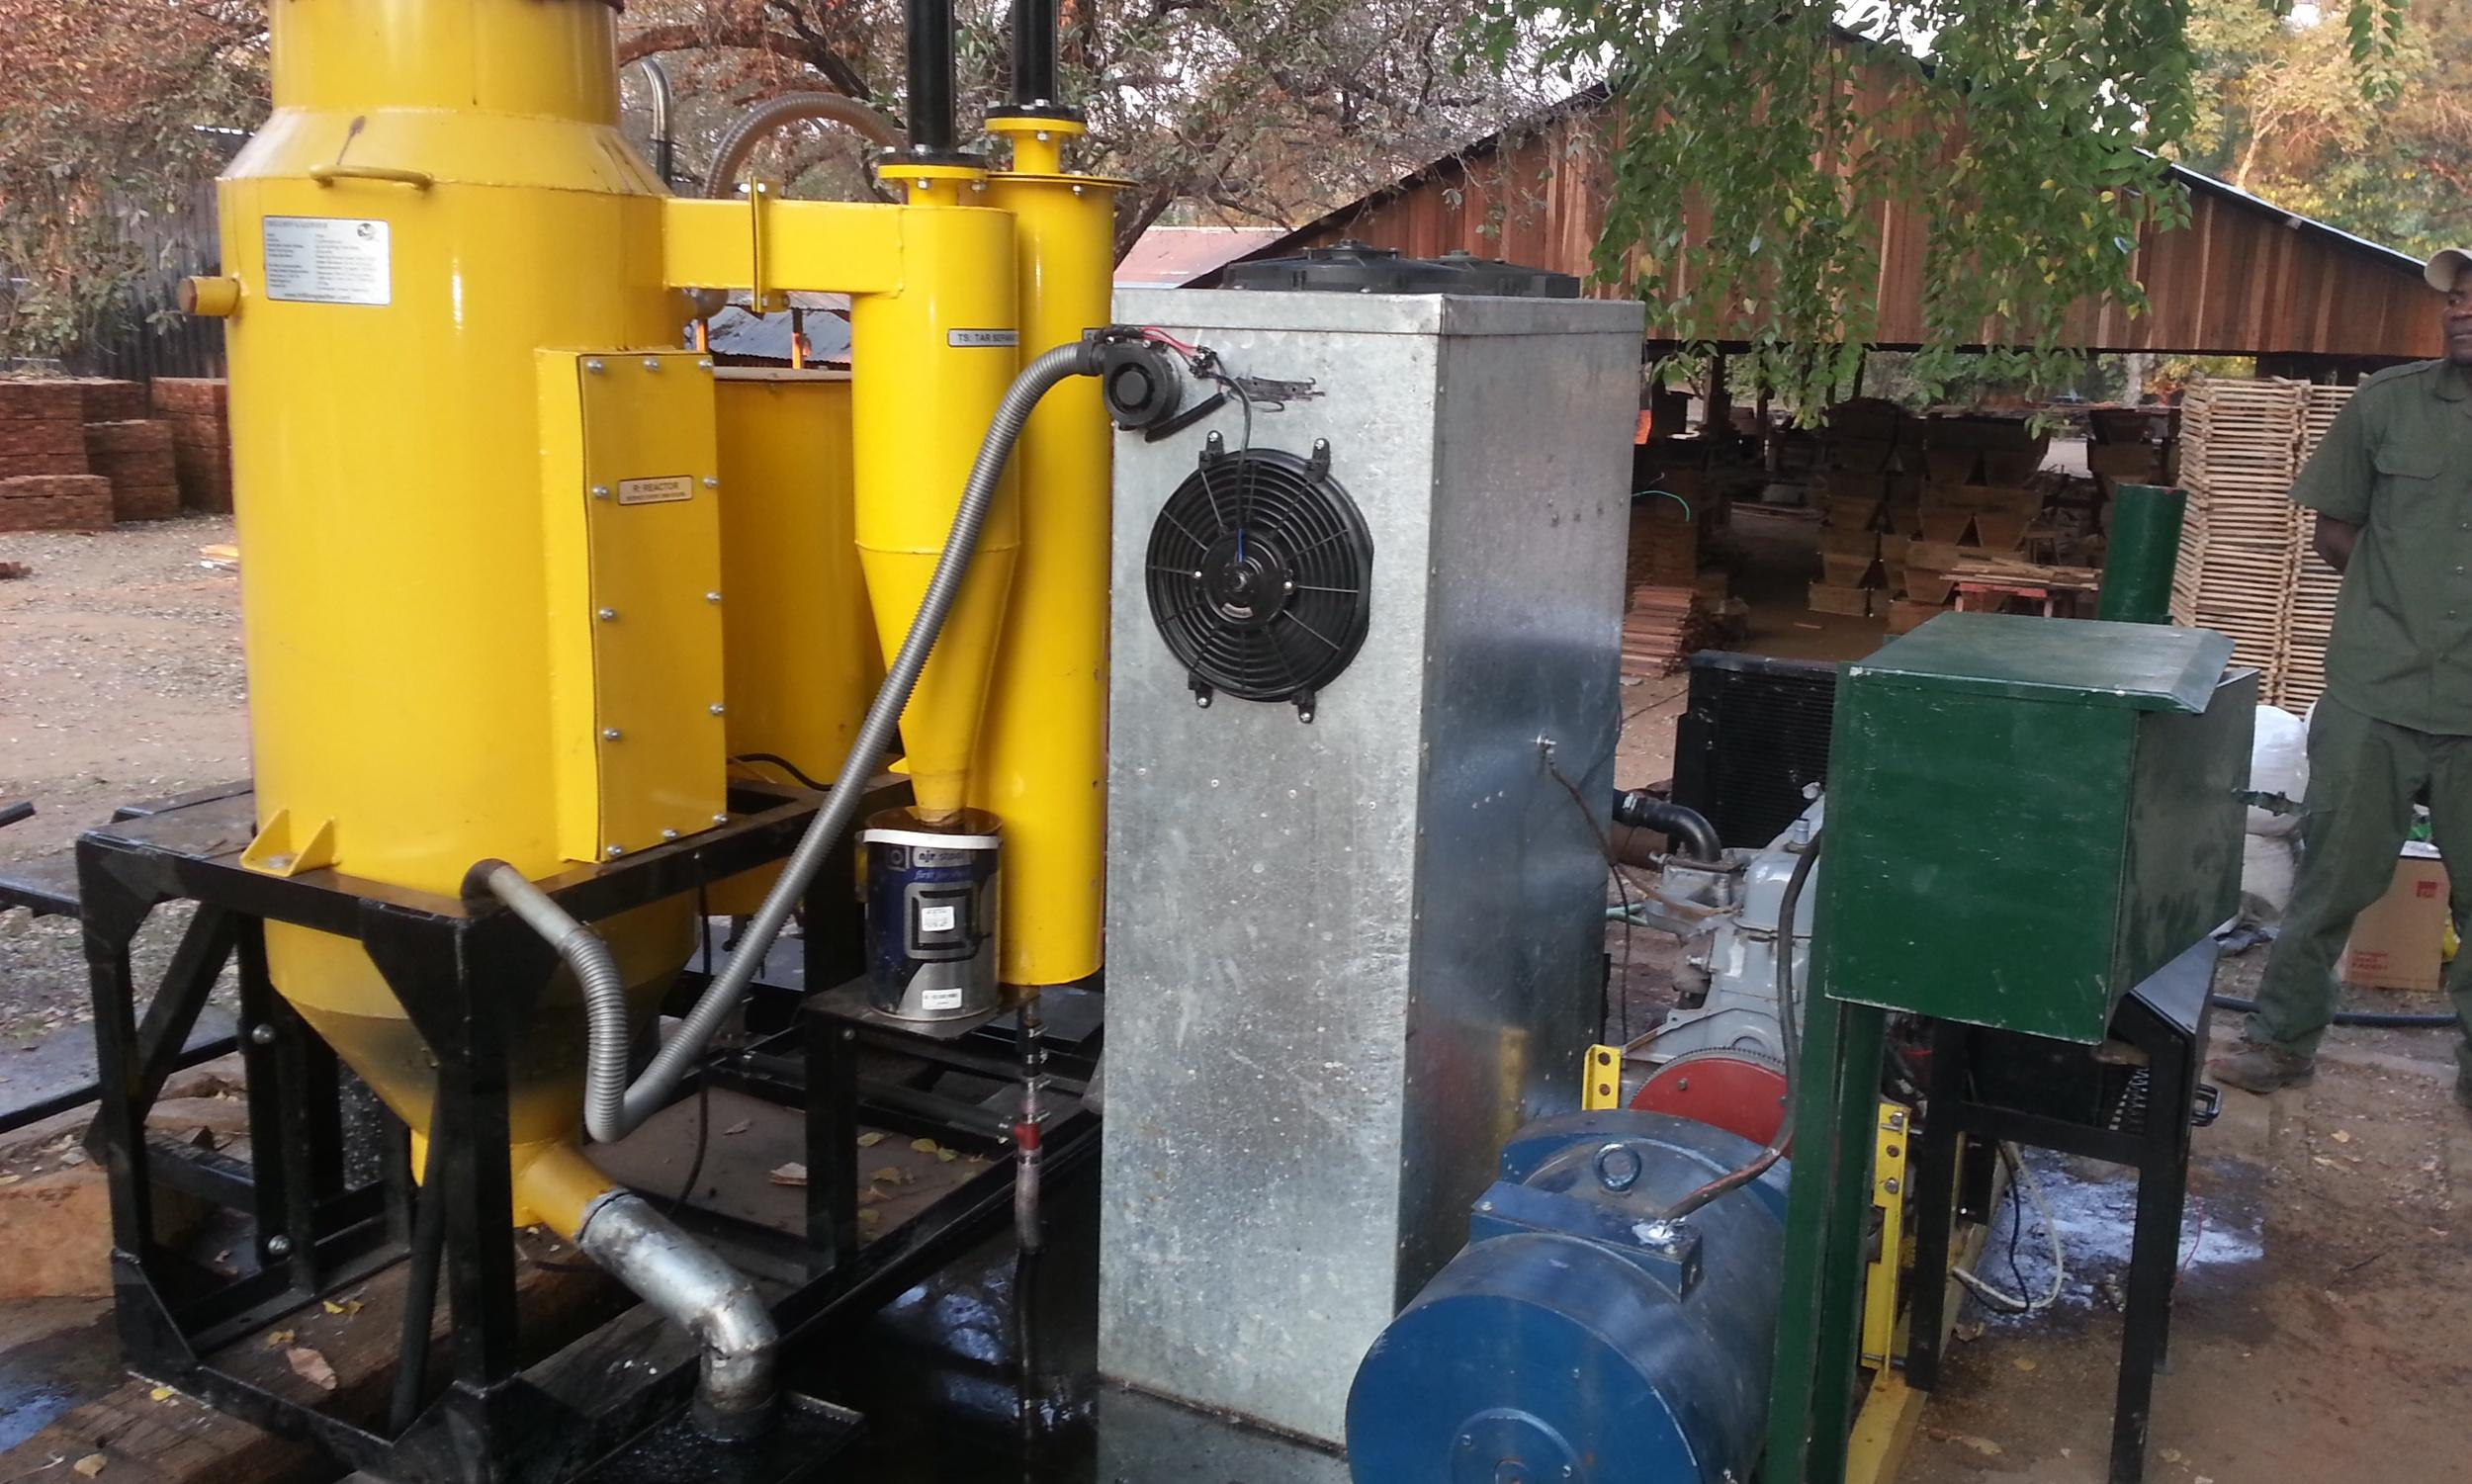 Gaseificador para gerar eletricidade para a vila  - Gasifier to generate electricity for the village